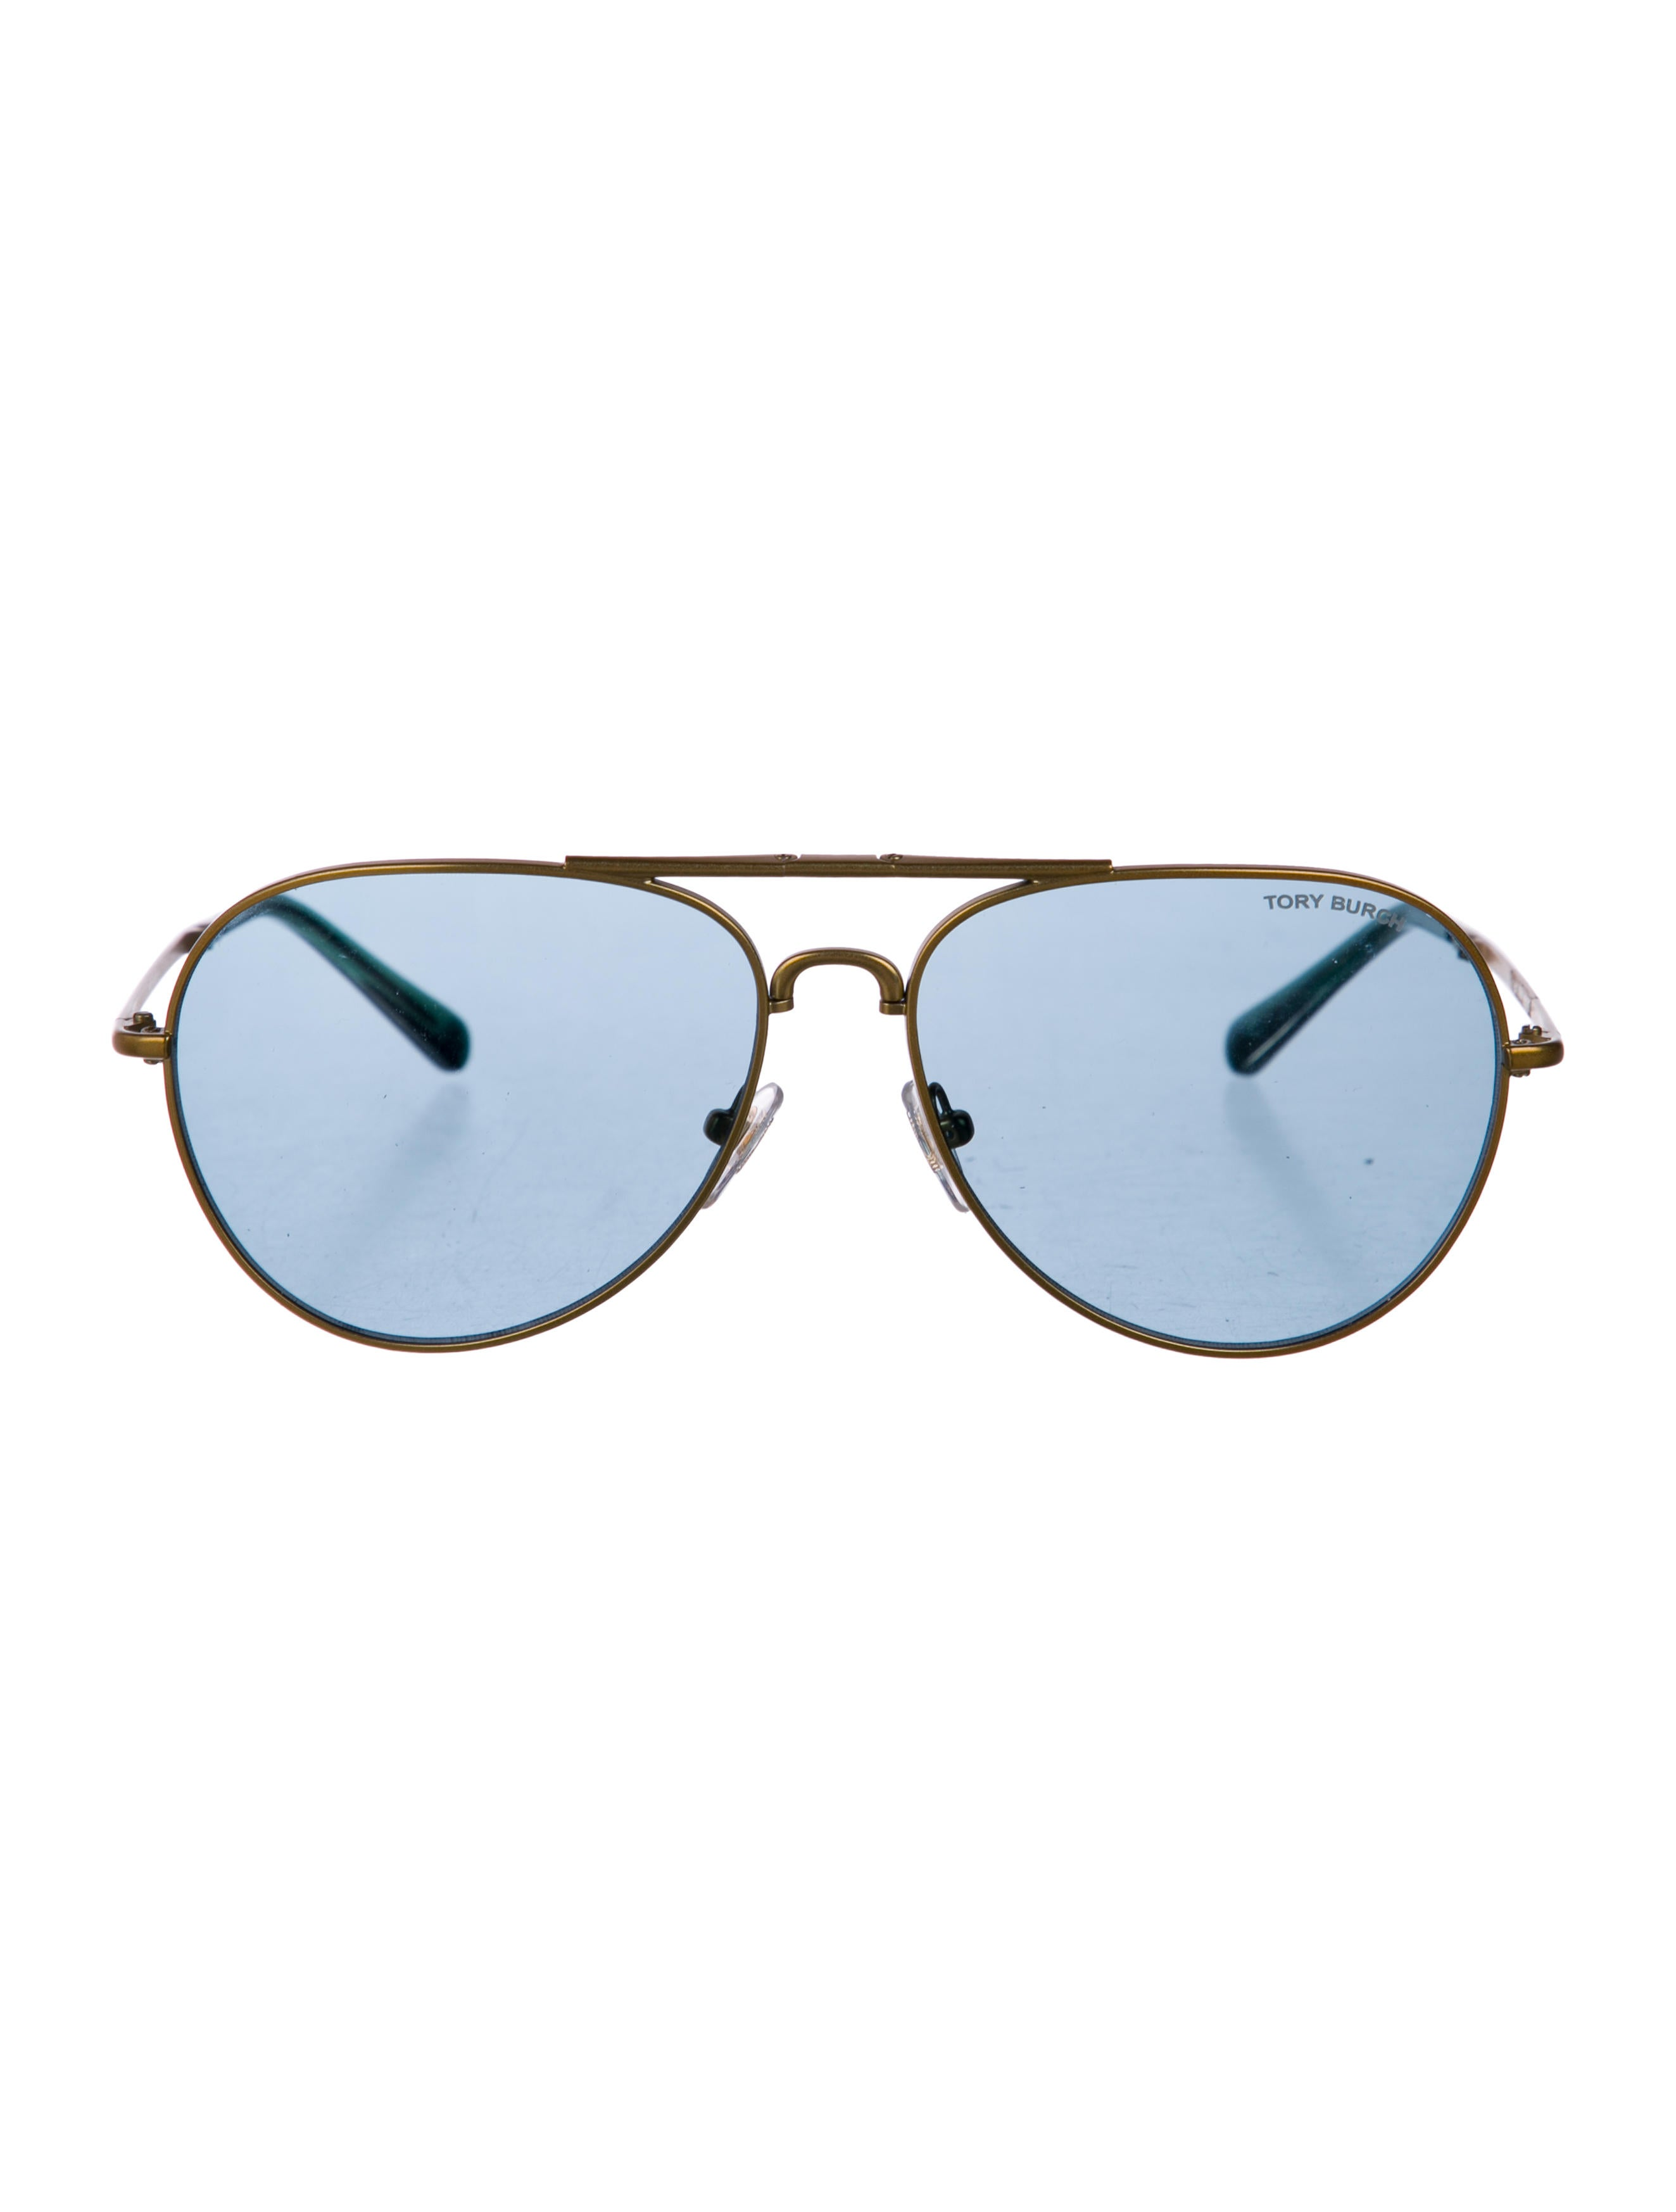 0da7dd122c42f Tory Burch Tinted Aviator Sunglasses w  Tags - Accessories ...